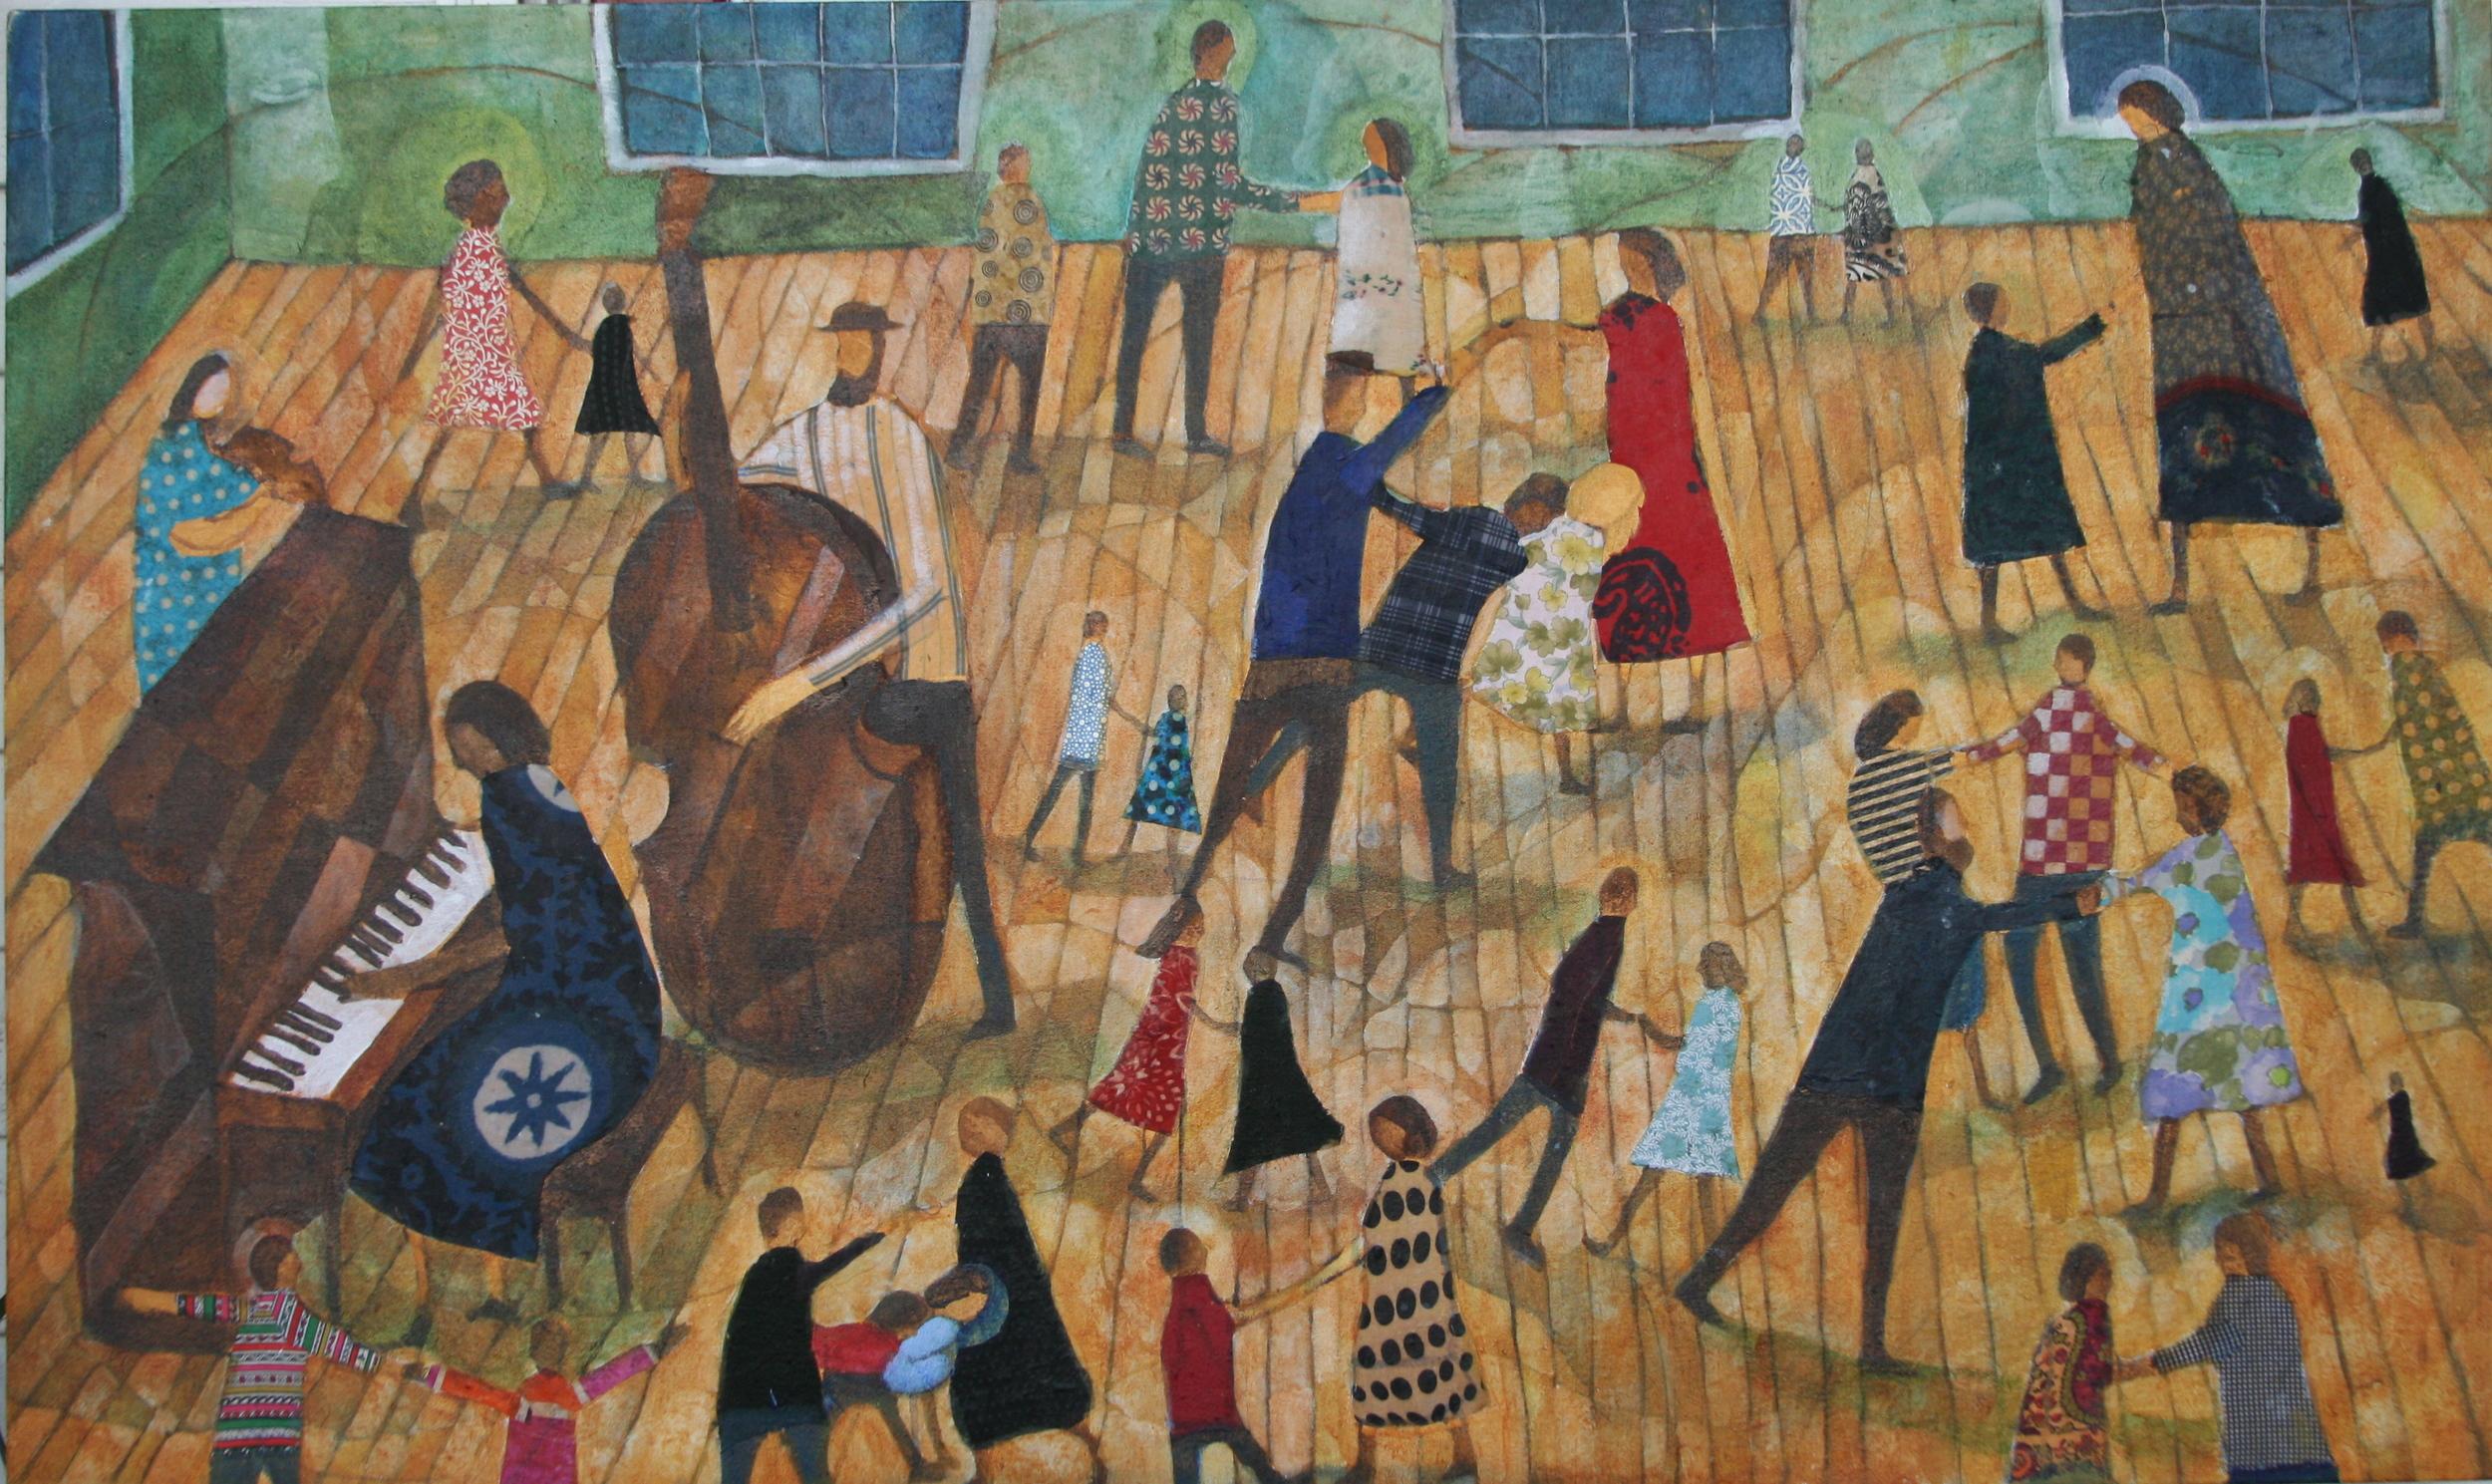 Dance, 36x72 Acrylic, Fabric on Canvas mounted on Panel, 2012, Bridgeport Memorial Hospital, Bridgeport, CT